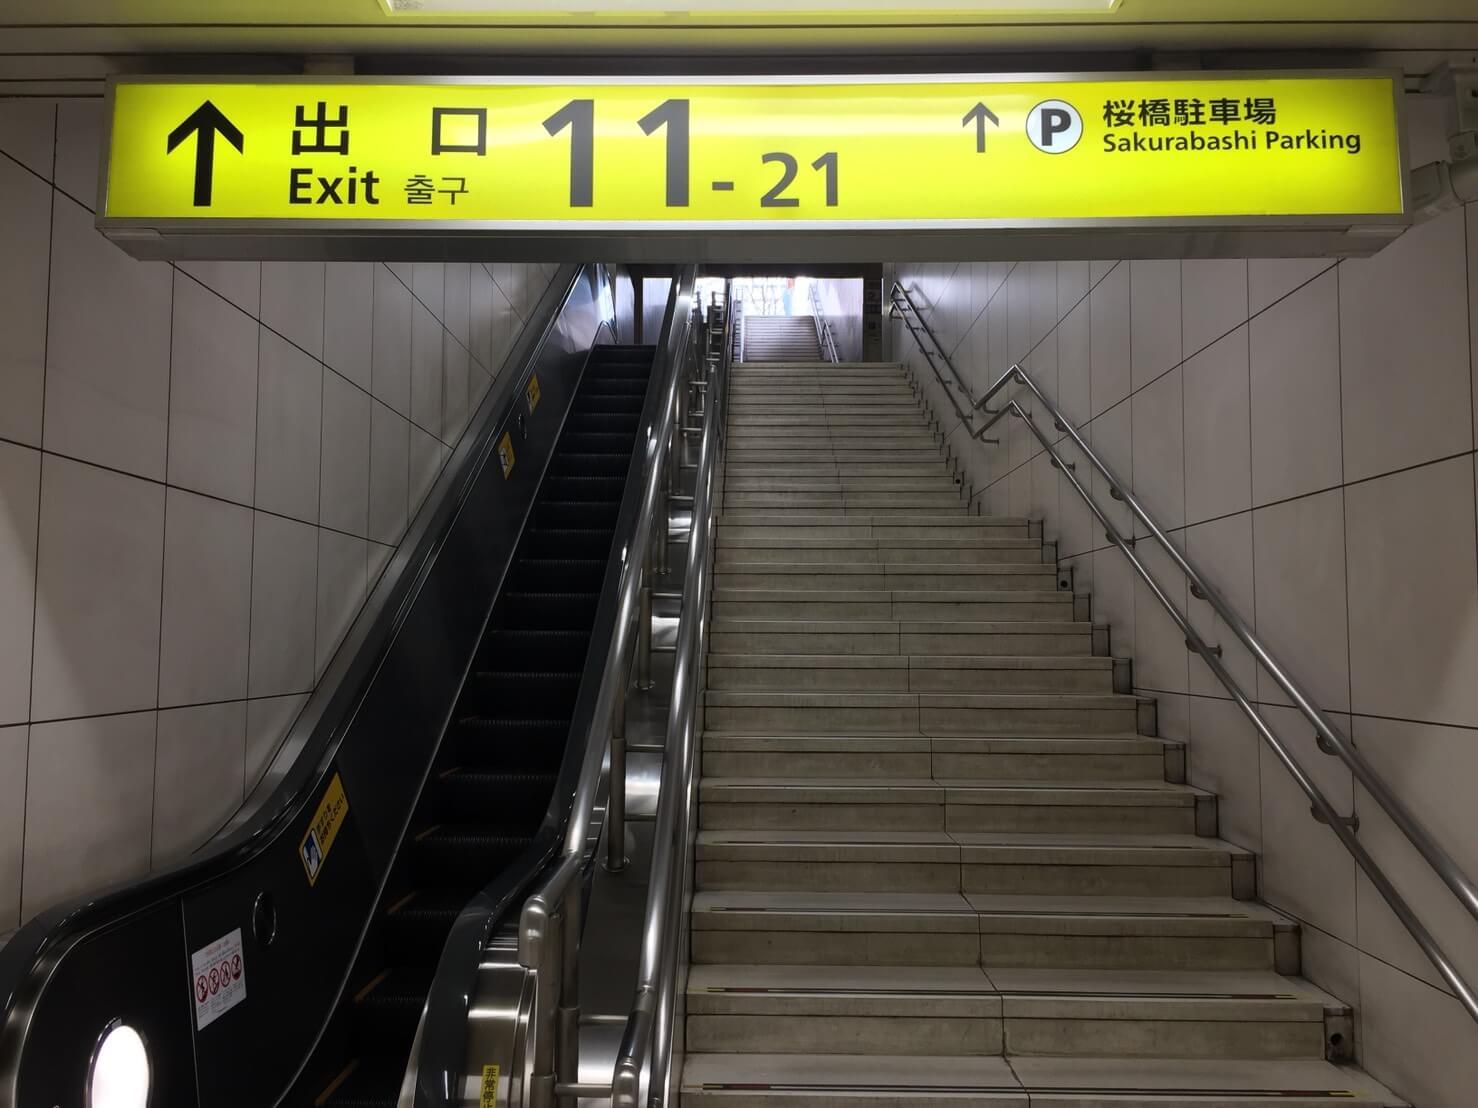 JR北新地駅の出口11−21を出ます。